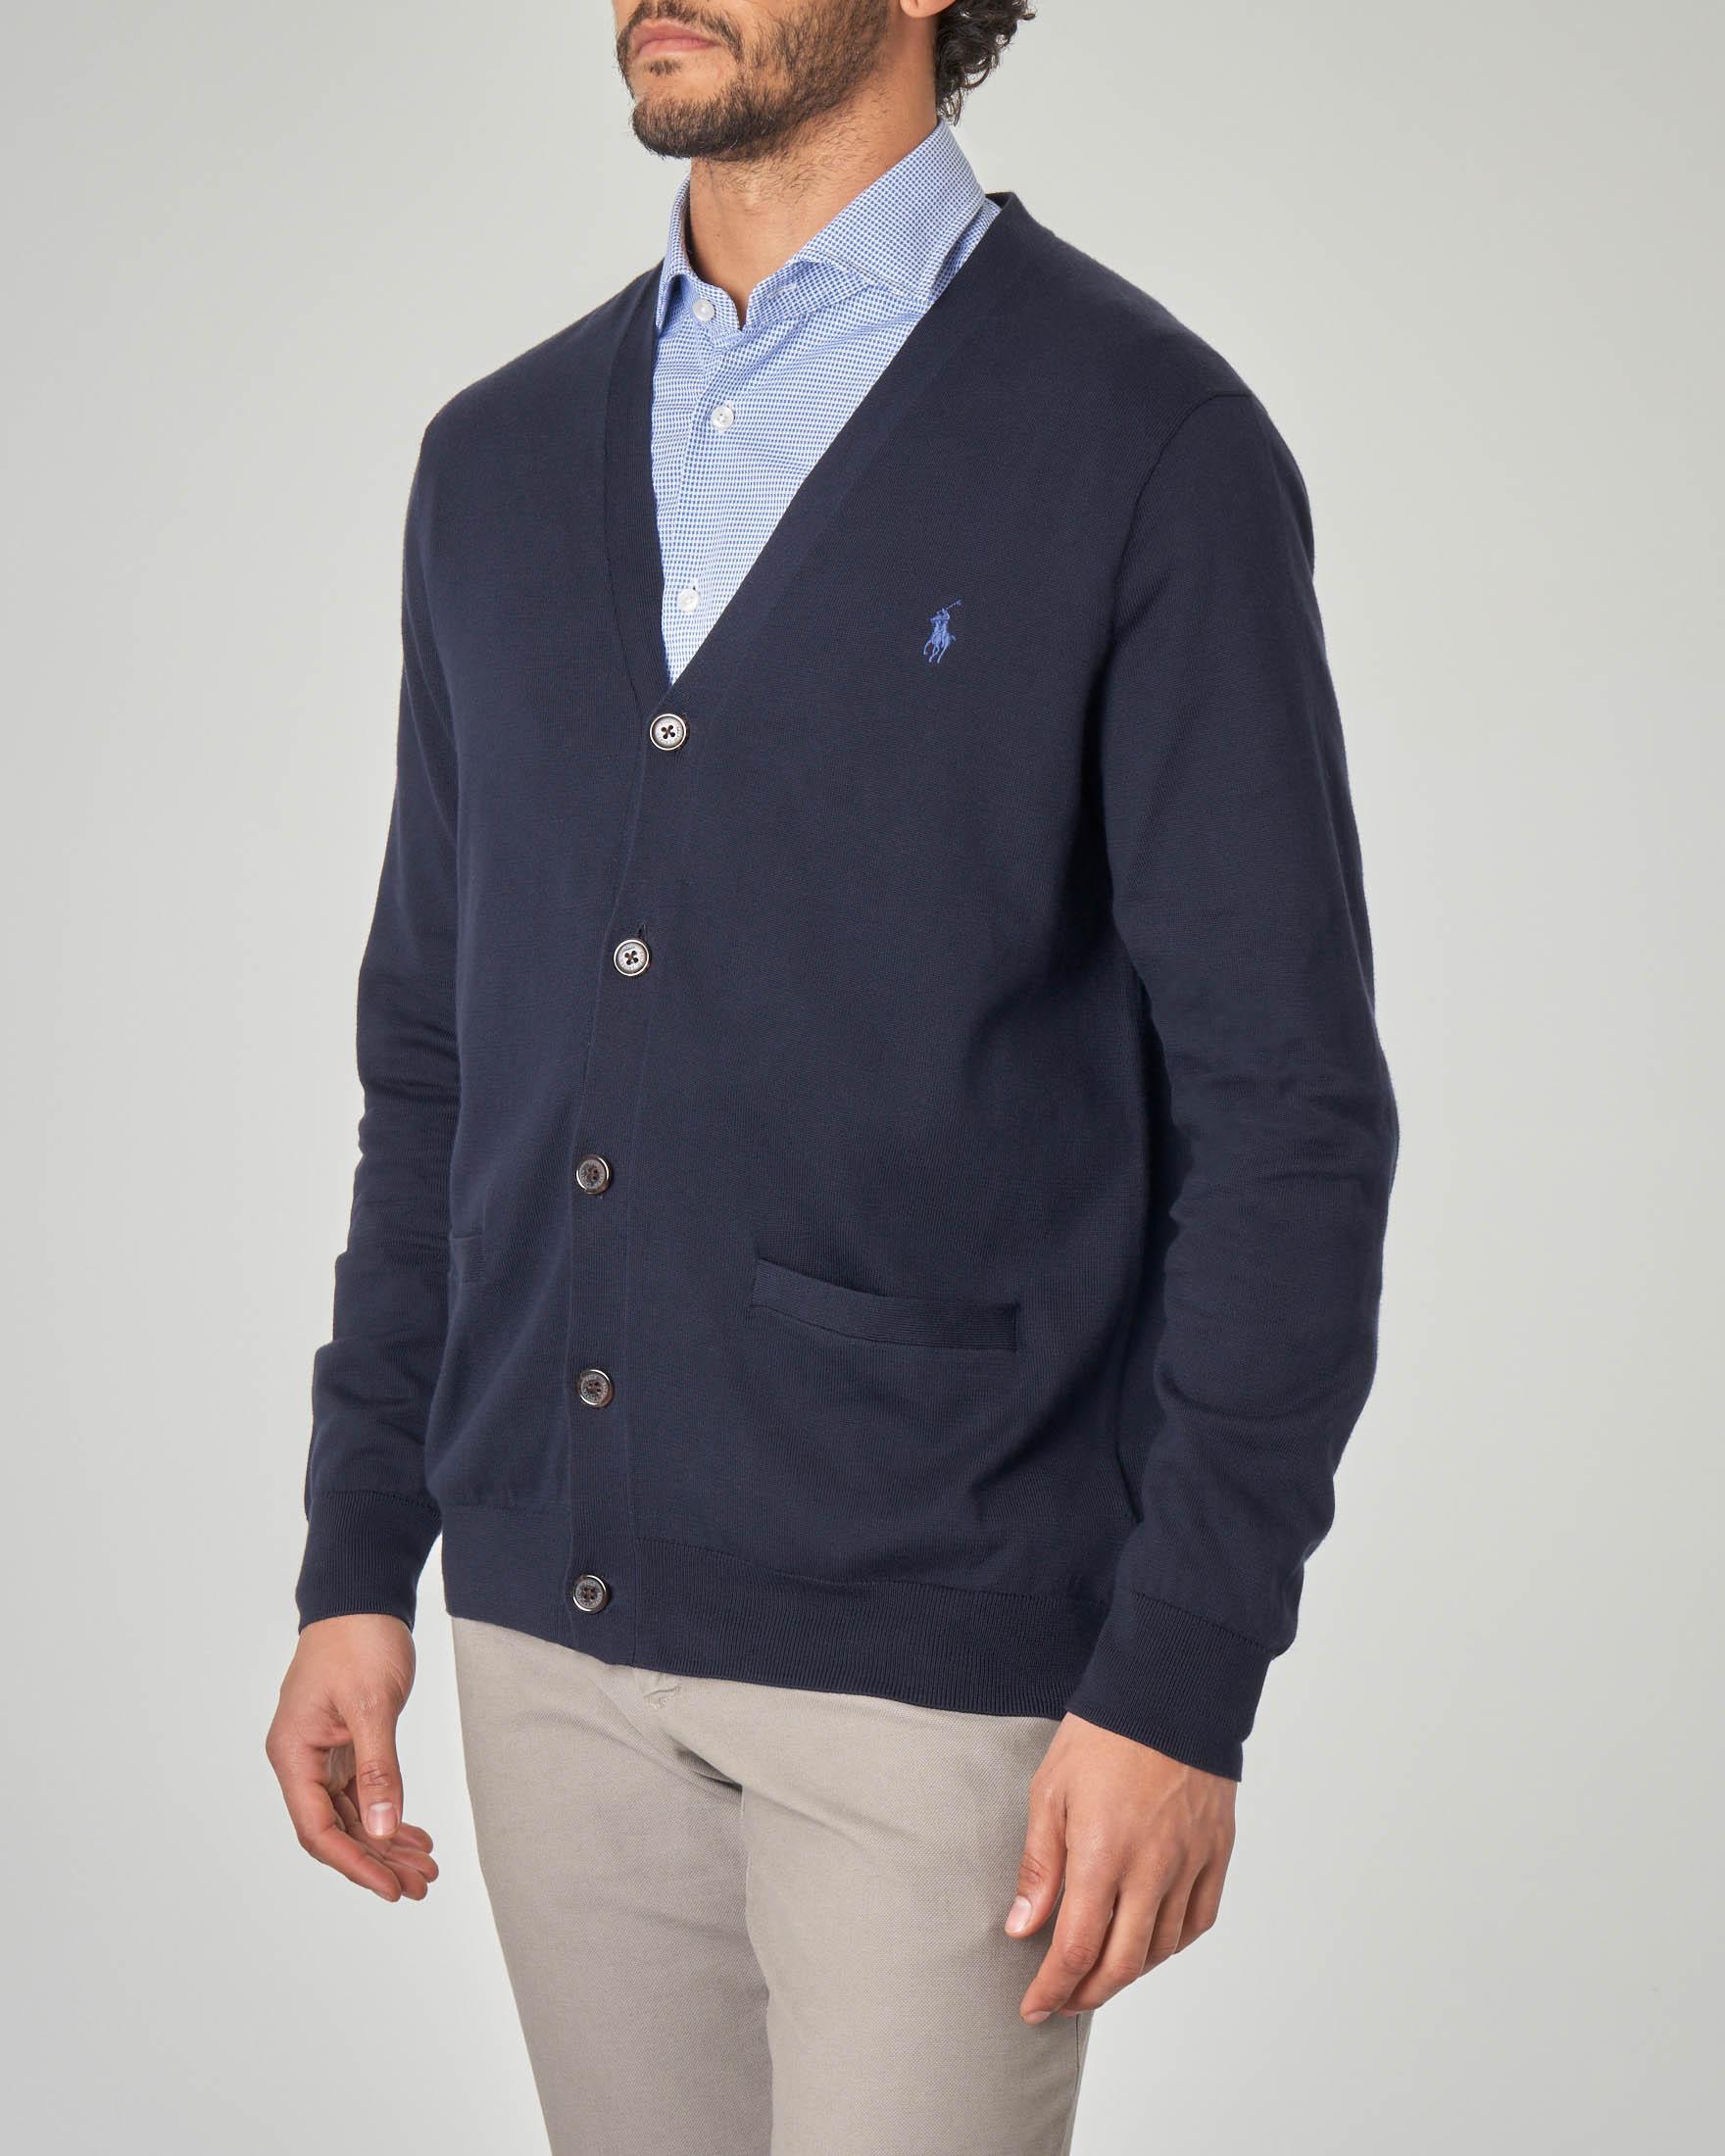 Cardigan blu con taschino